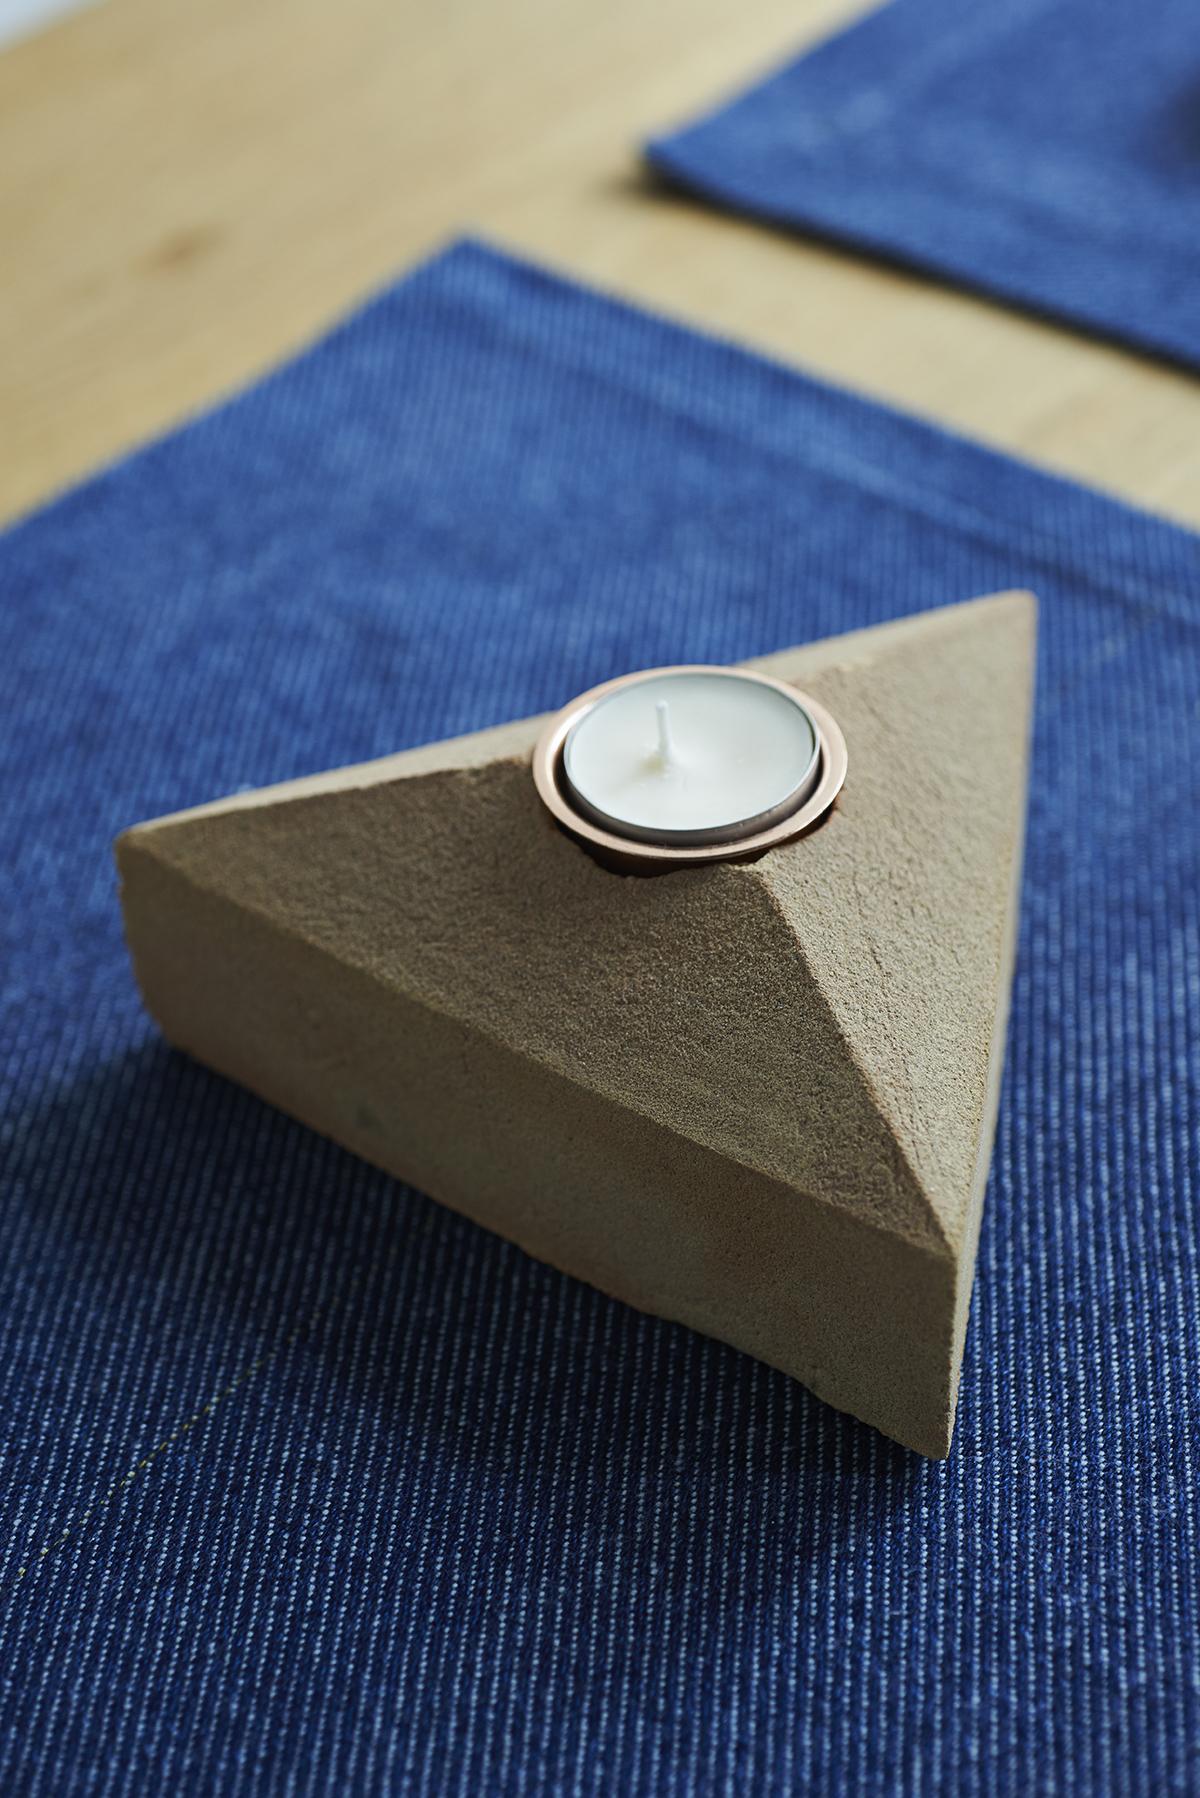 Lane Sand Cast Brick Tealight Holder and London Cloth Cotton Placemats 1 LR.jpg